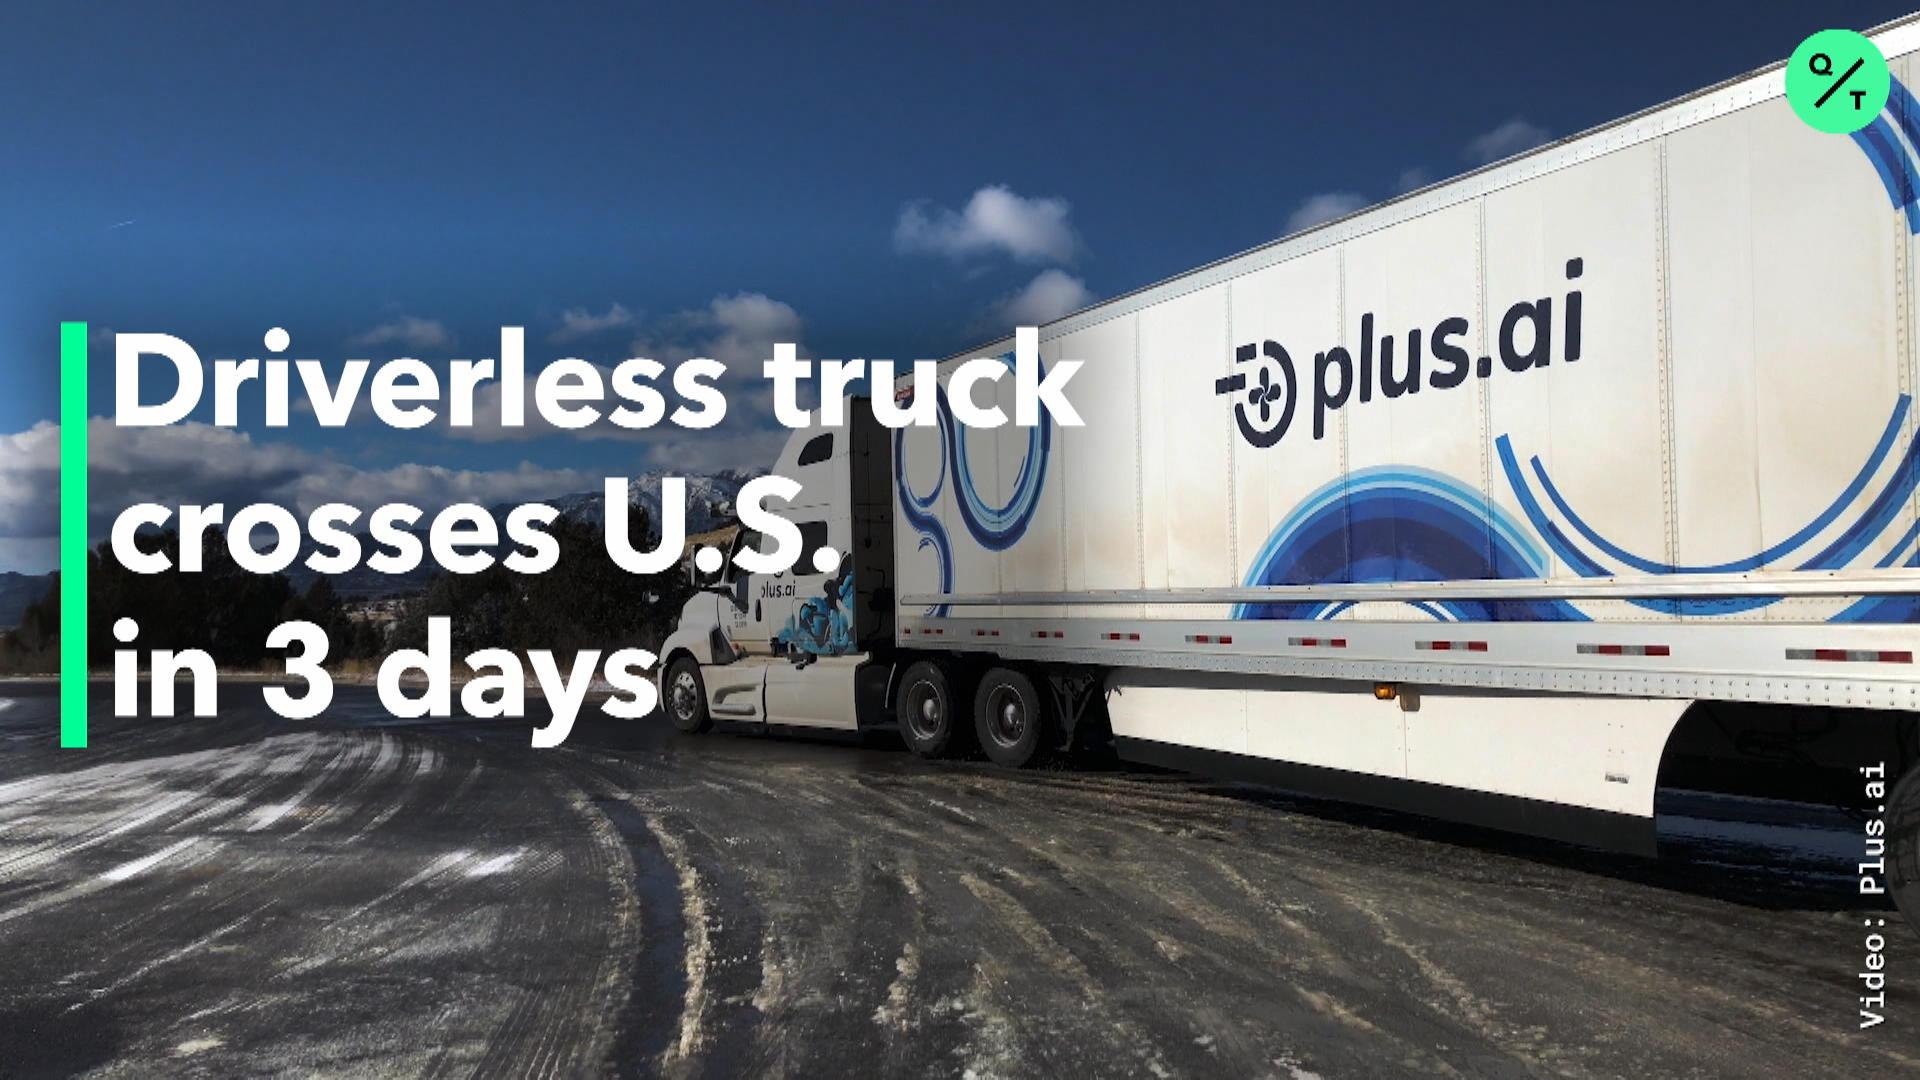 Driverless Truck Crosses U.S. In 3 Days